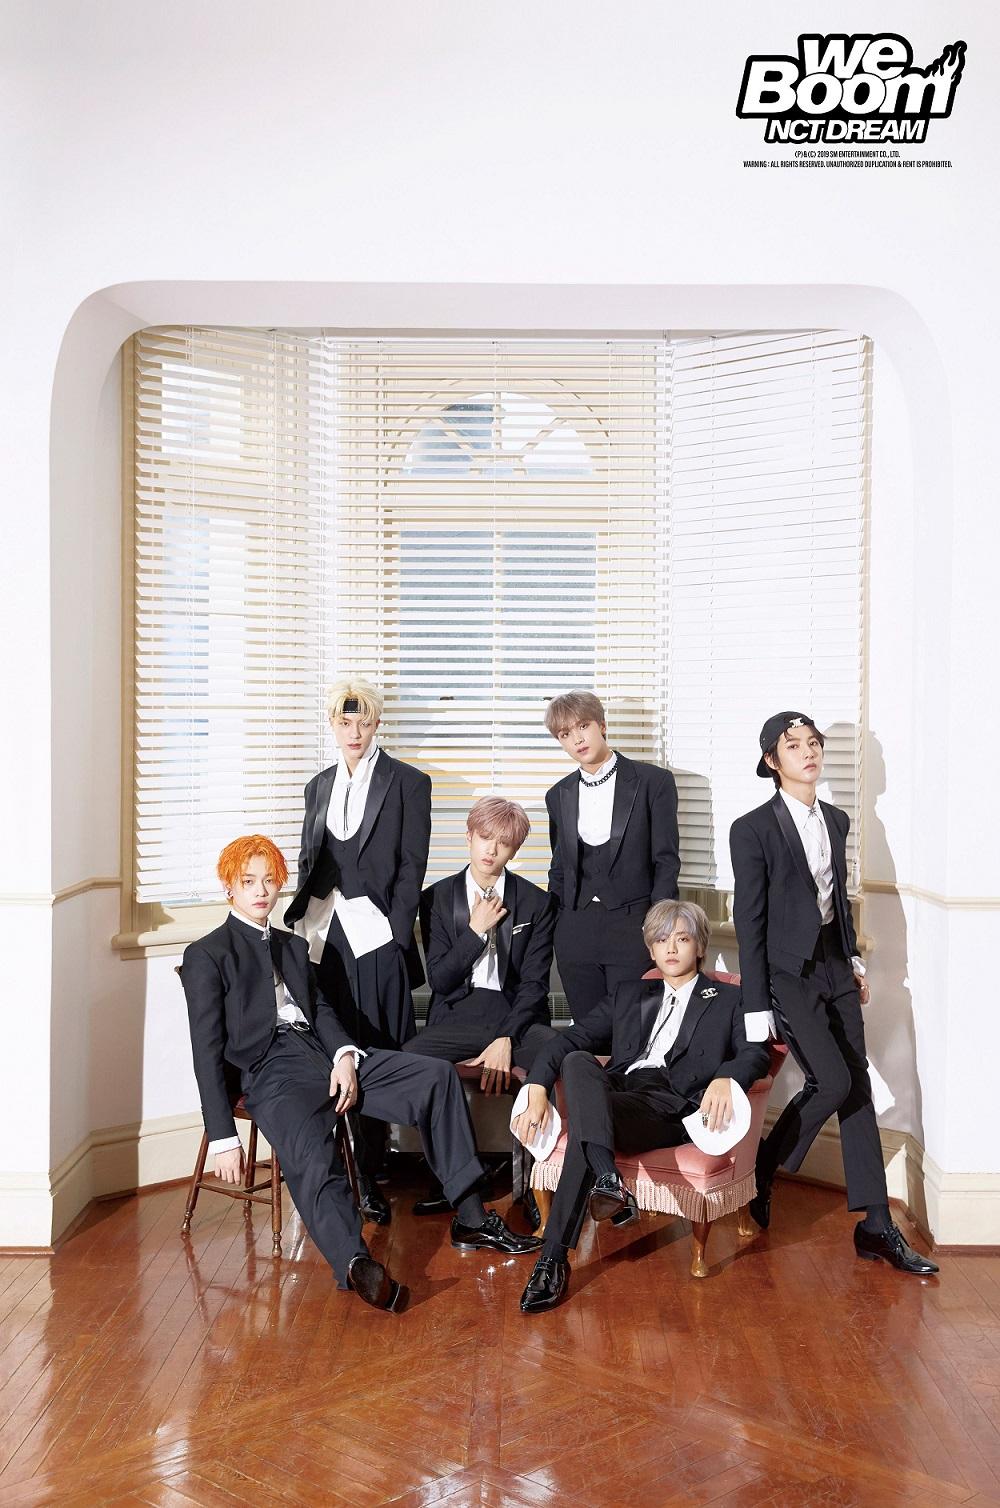 [Group Image 4] NCT DREAM The 3rd Mini Album 'We Boom'